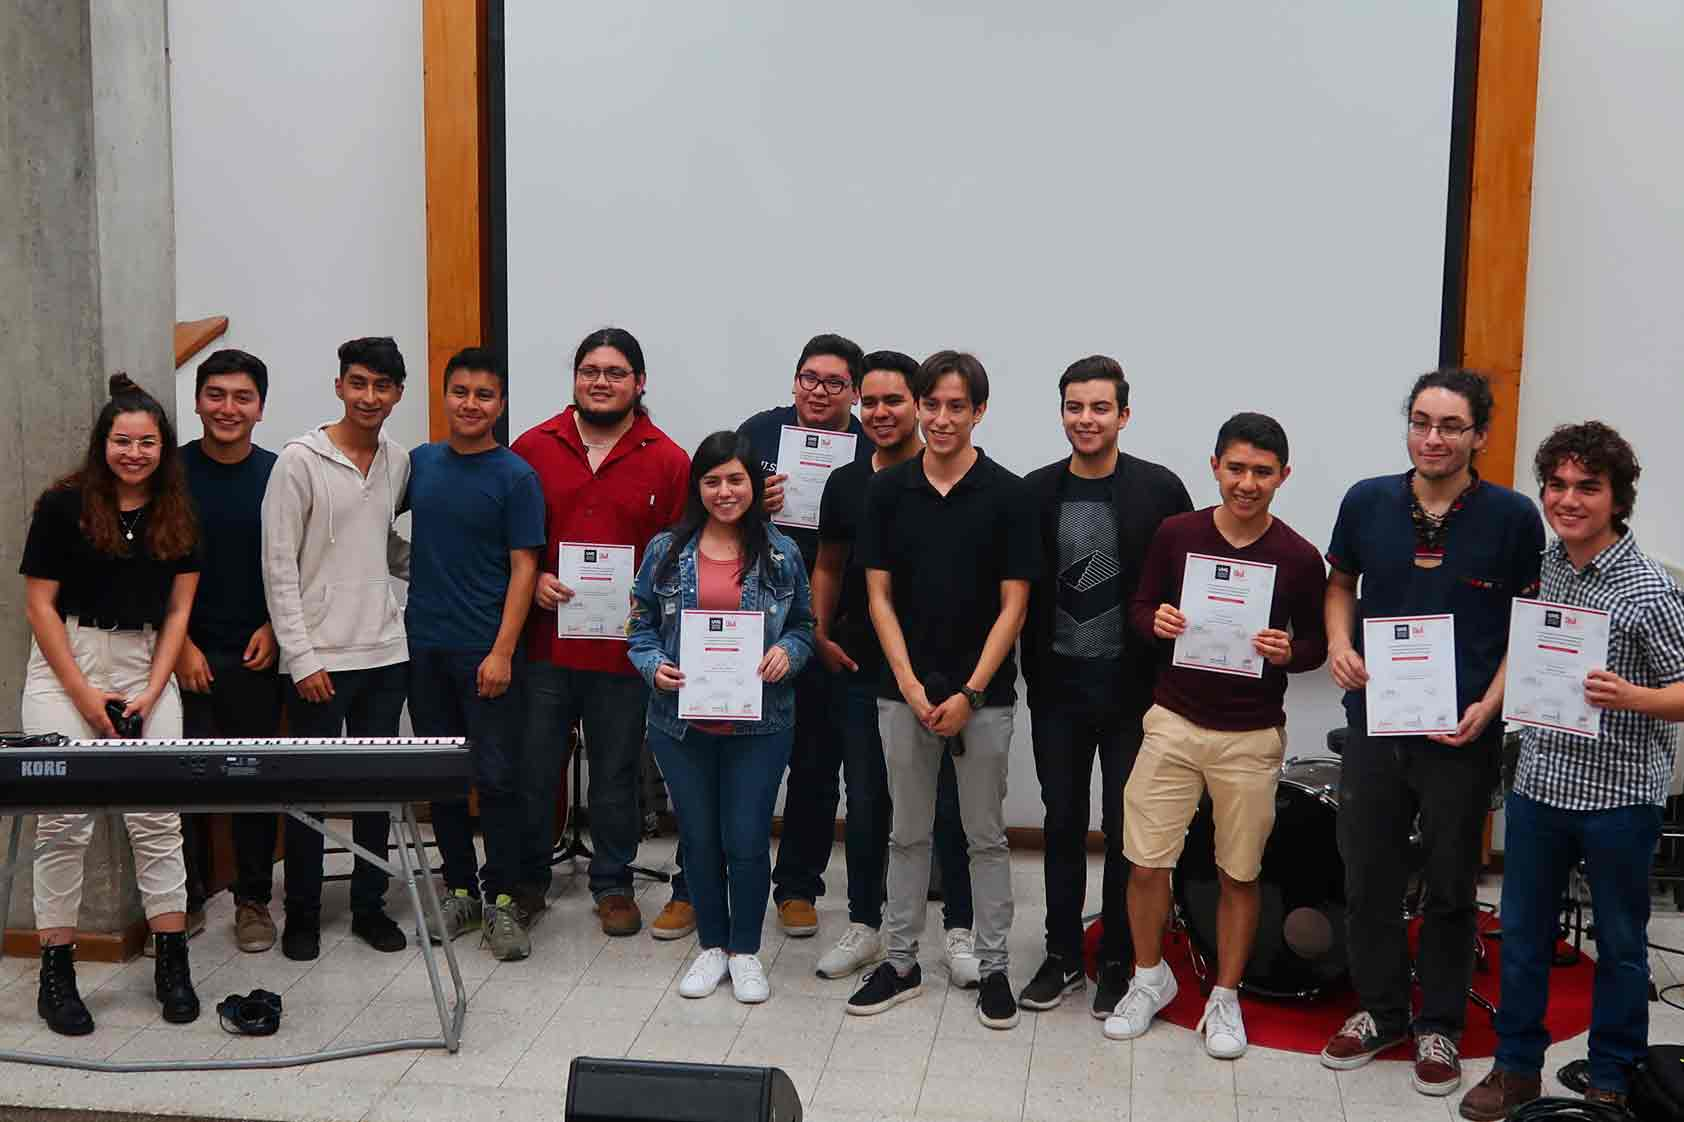 Primer concurso de composición musical: ¡En UVG hay talento!